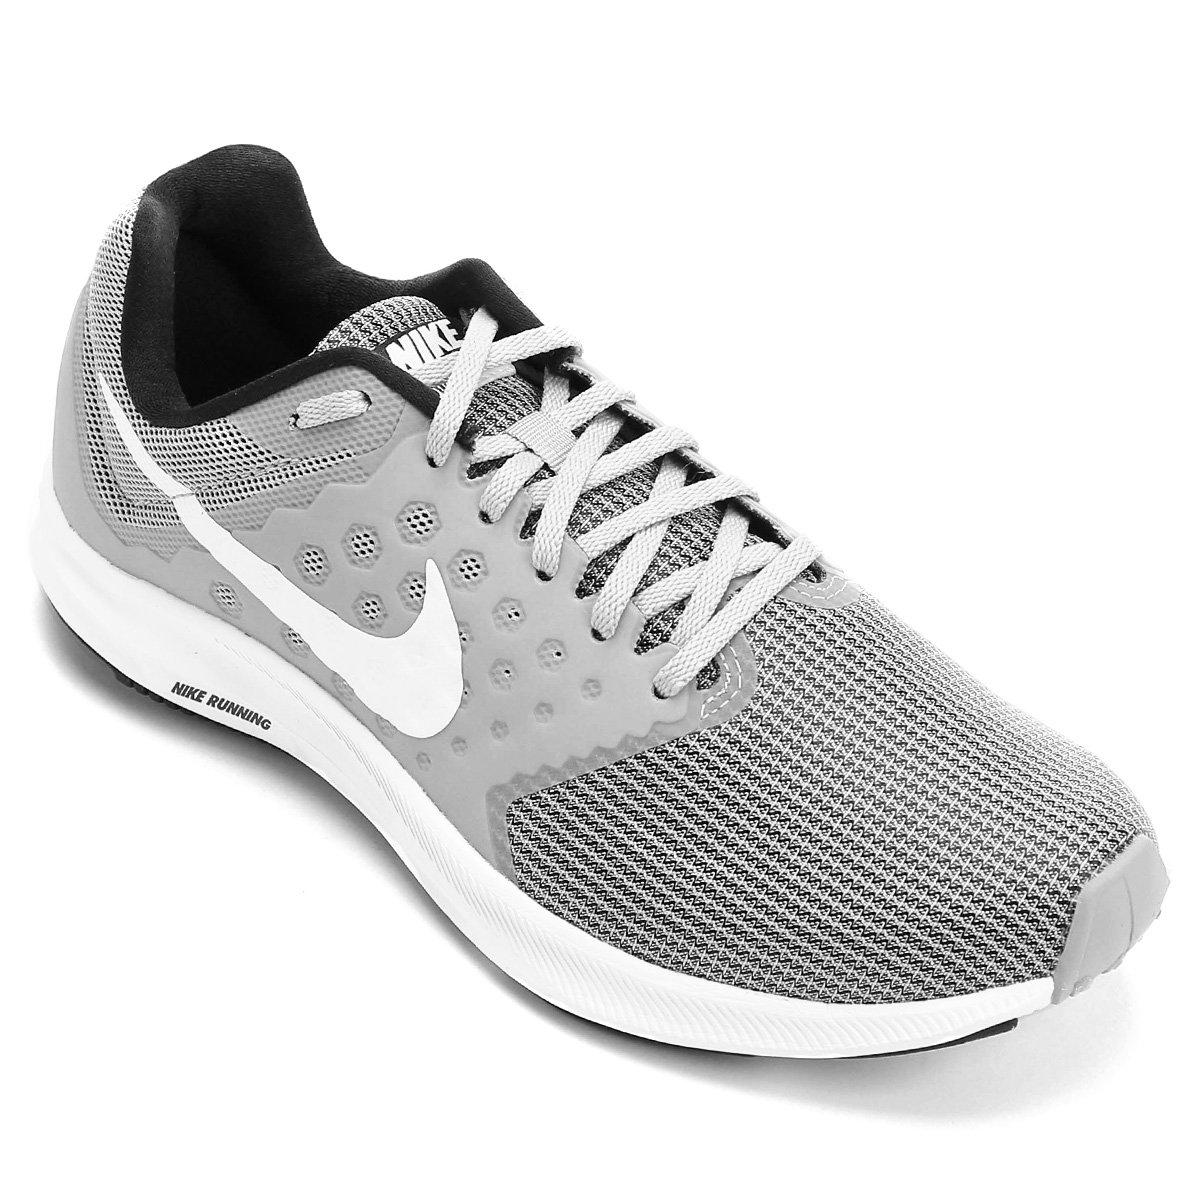 937ff12e8 Tênis Nike Downshifter 7 Masculino - Compre Agora